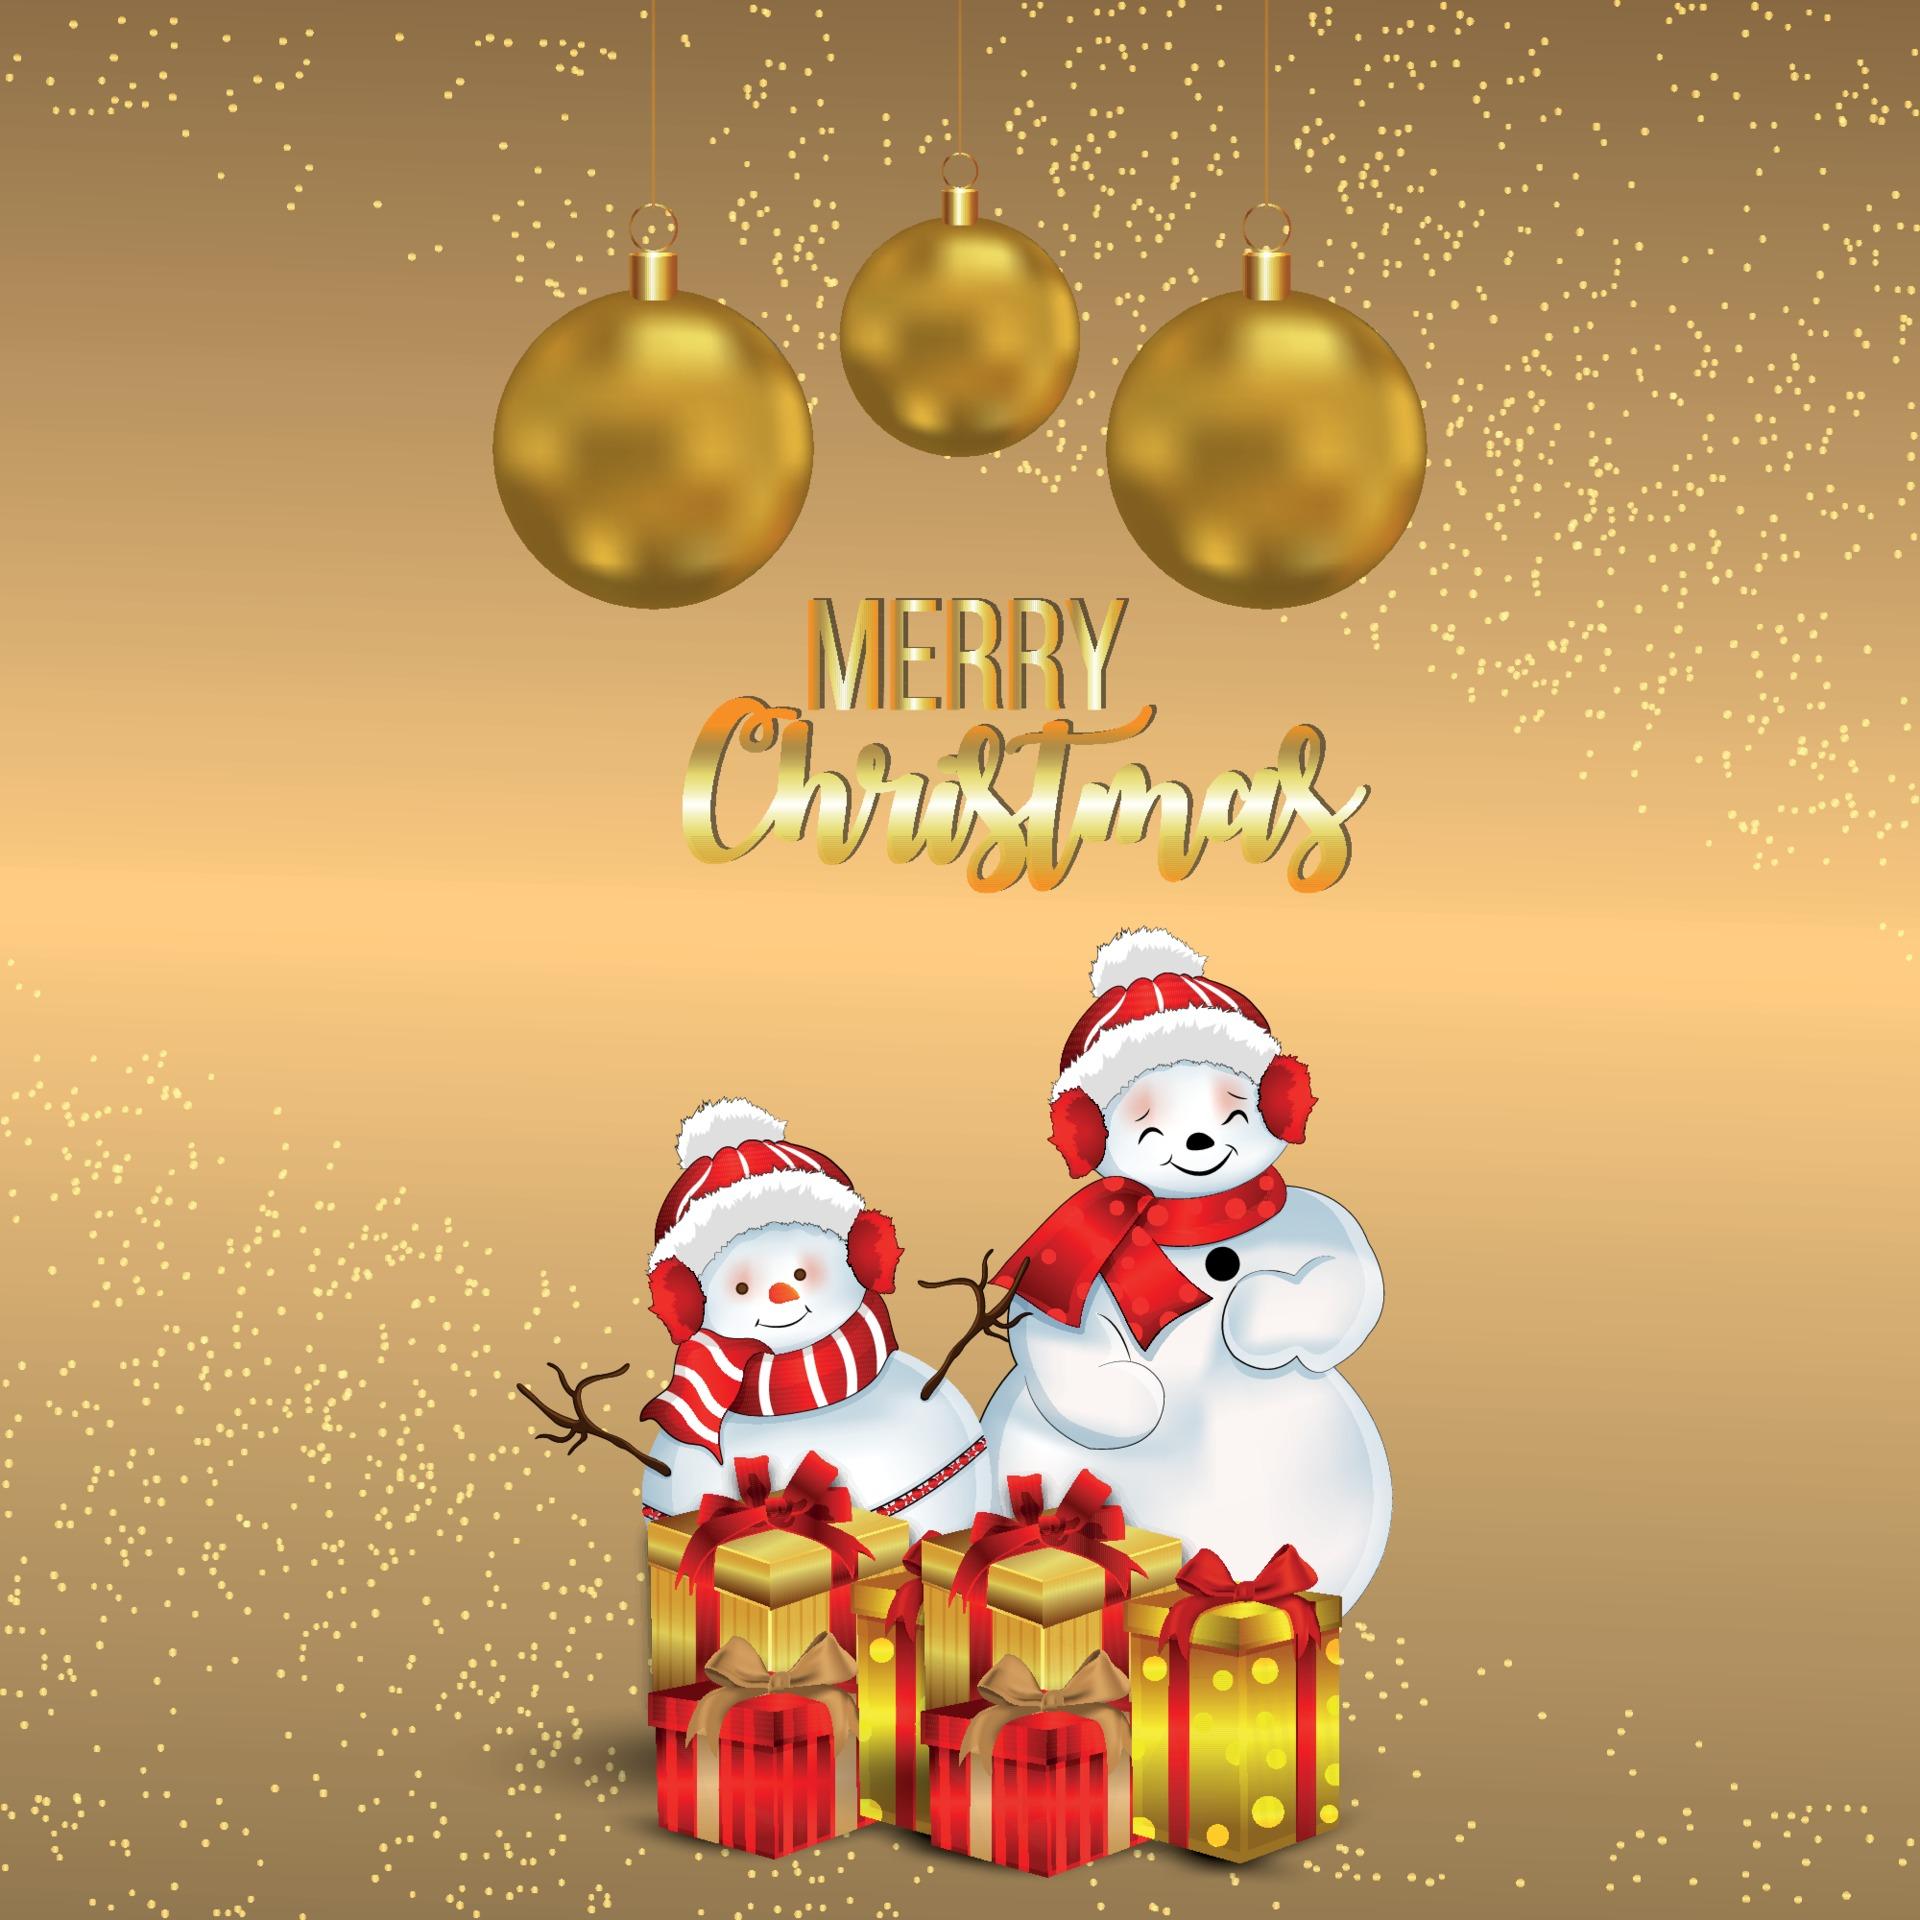 Auguri Di Natale Immagini Gratis.Immagini Per Auguri Di Natale Gratis